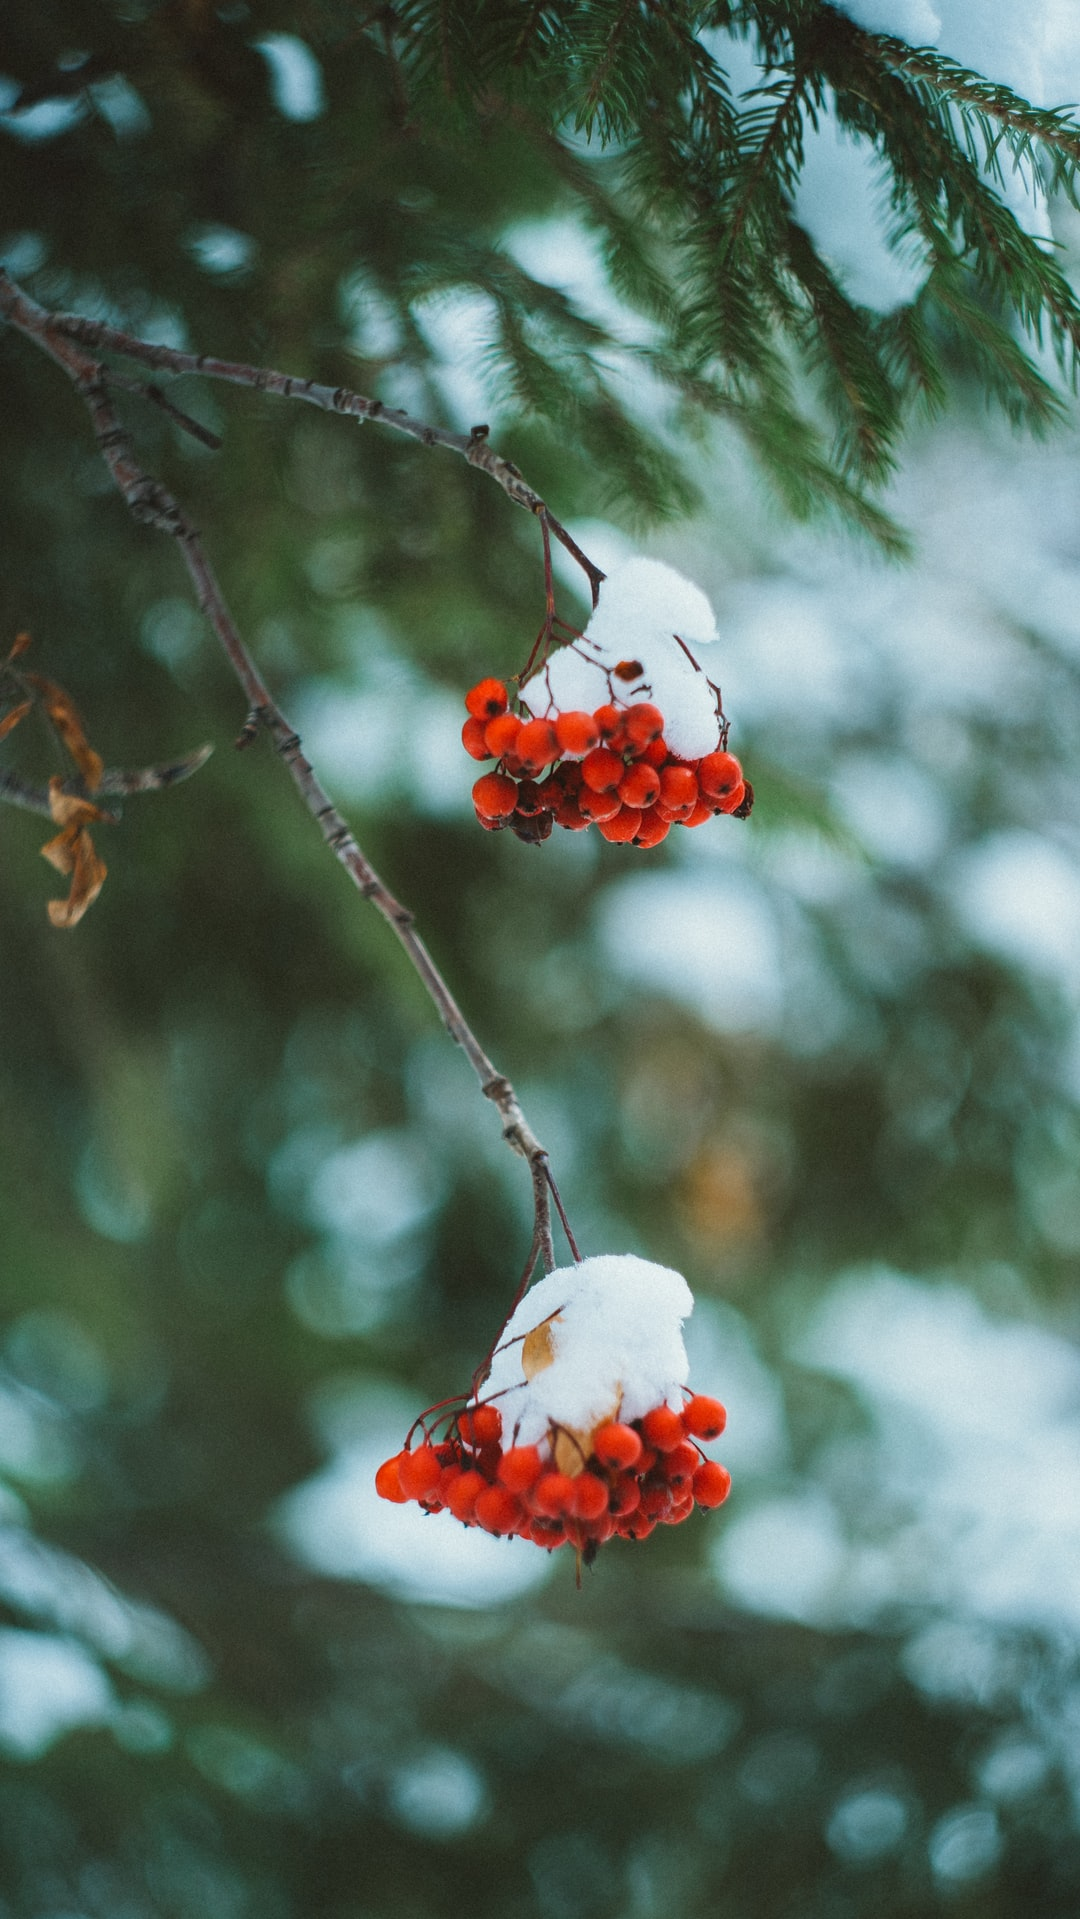 Winter rowan berry under snow